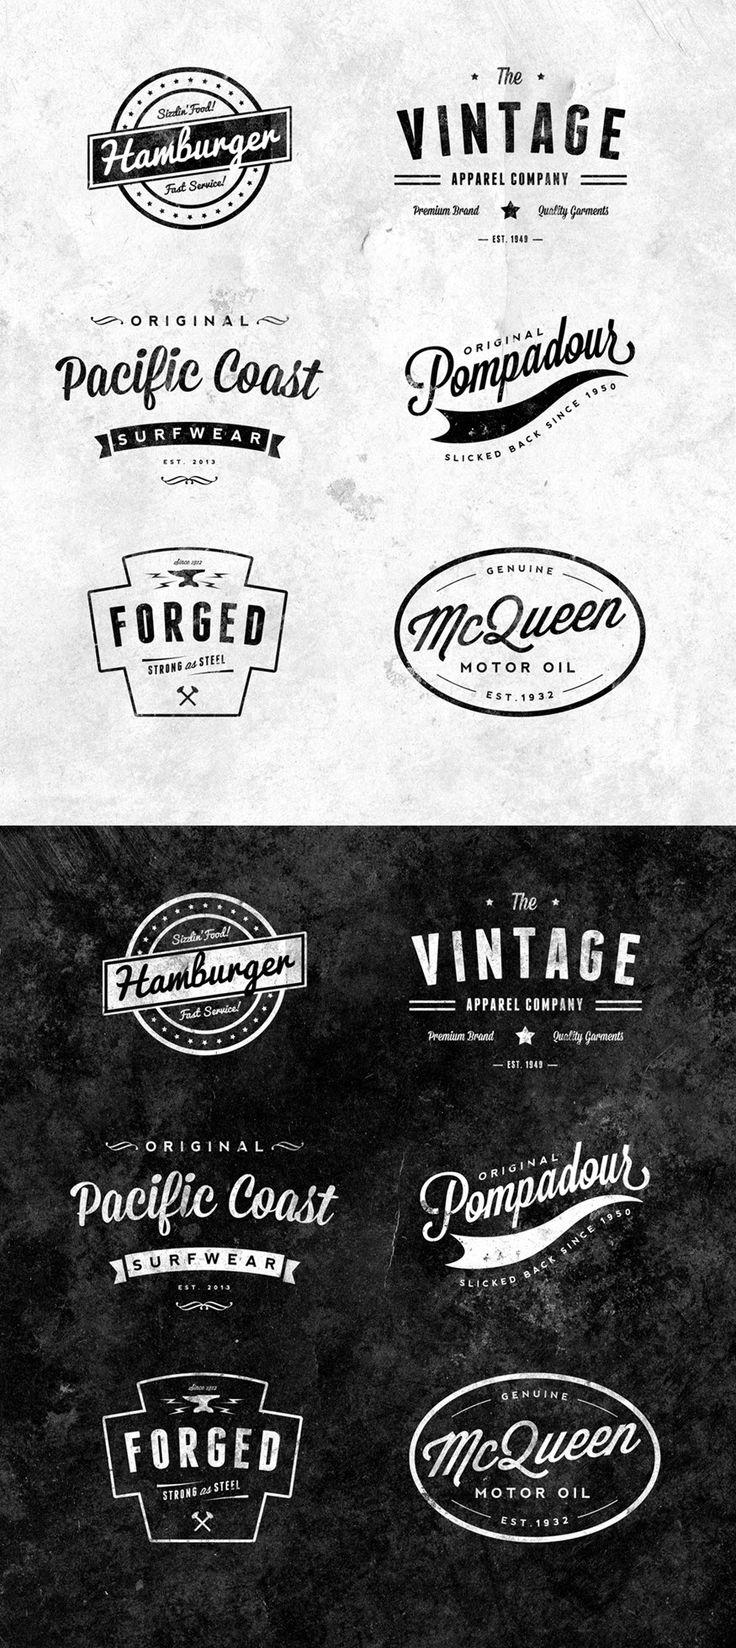 FreebiesQuest - 6 Free Customizable Retro/Vintage Logos & Emblems by Chris Spooner